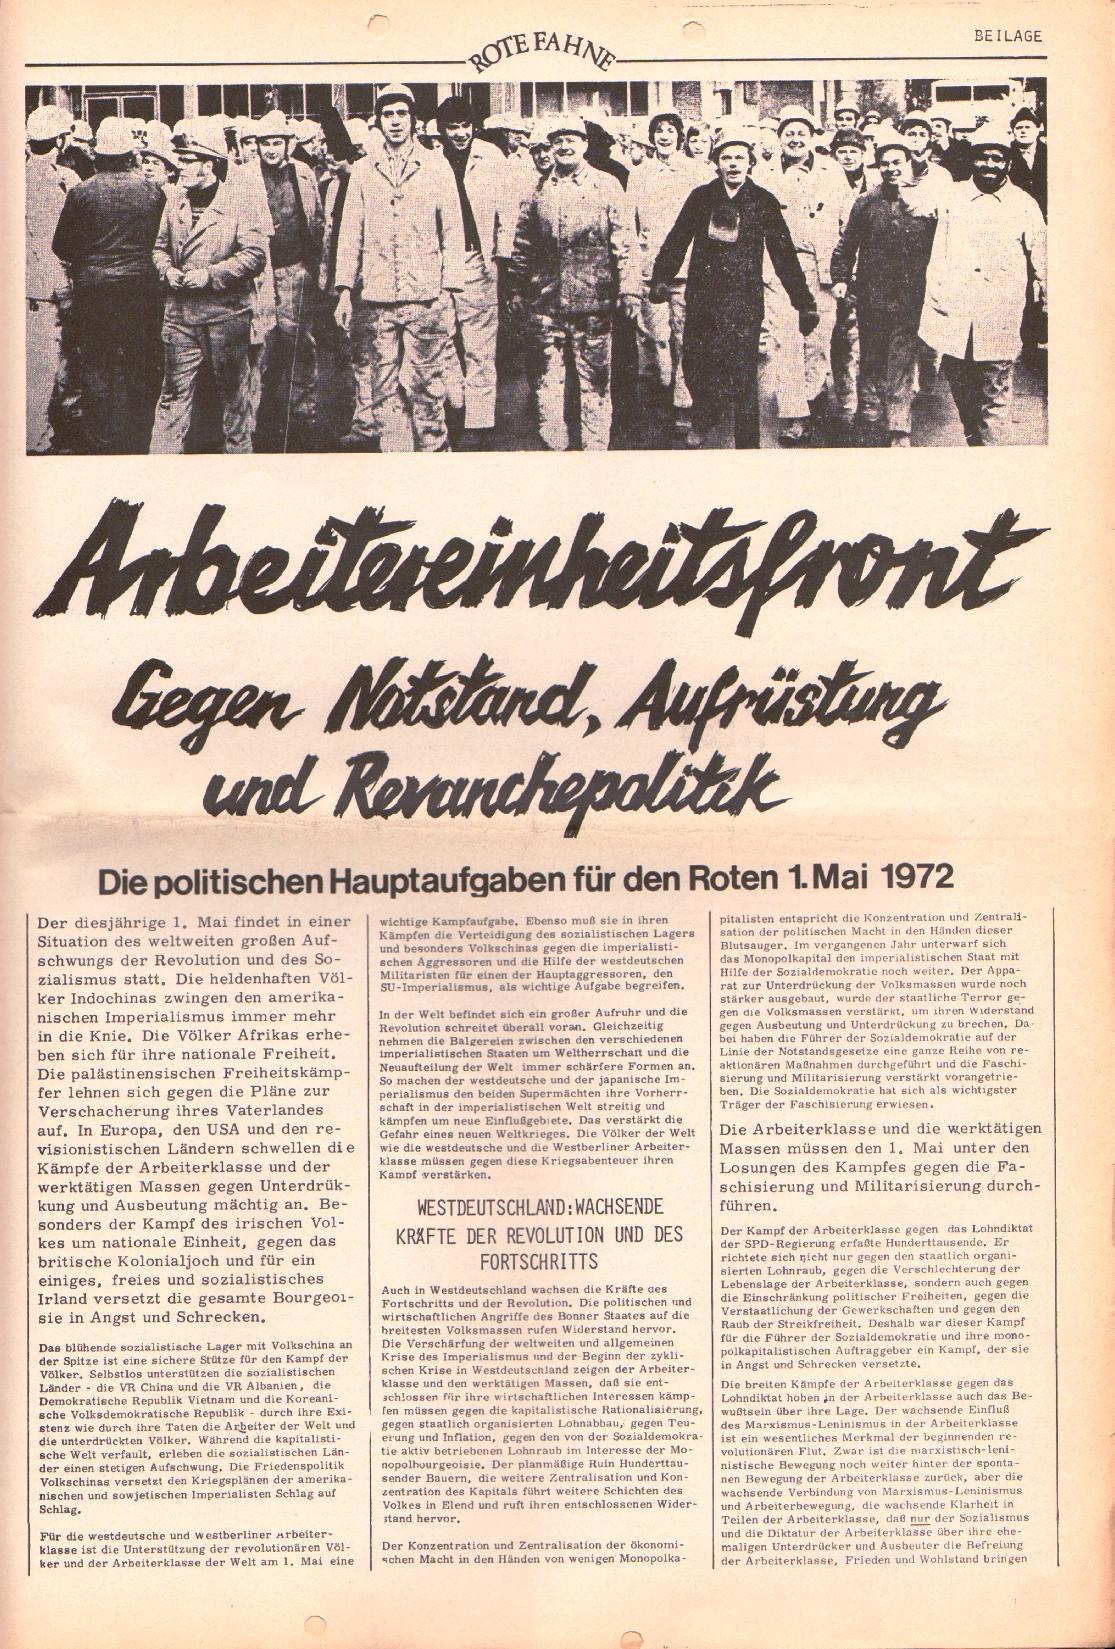 Rote Fahne, 3. Jg., 20.3.1972, Nr. 6, Beilage, Seite 1